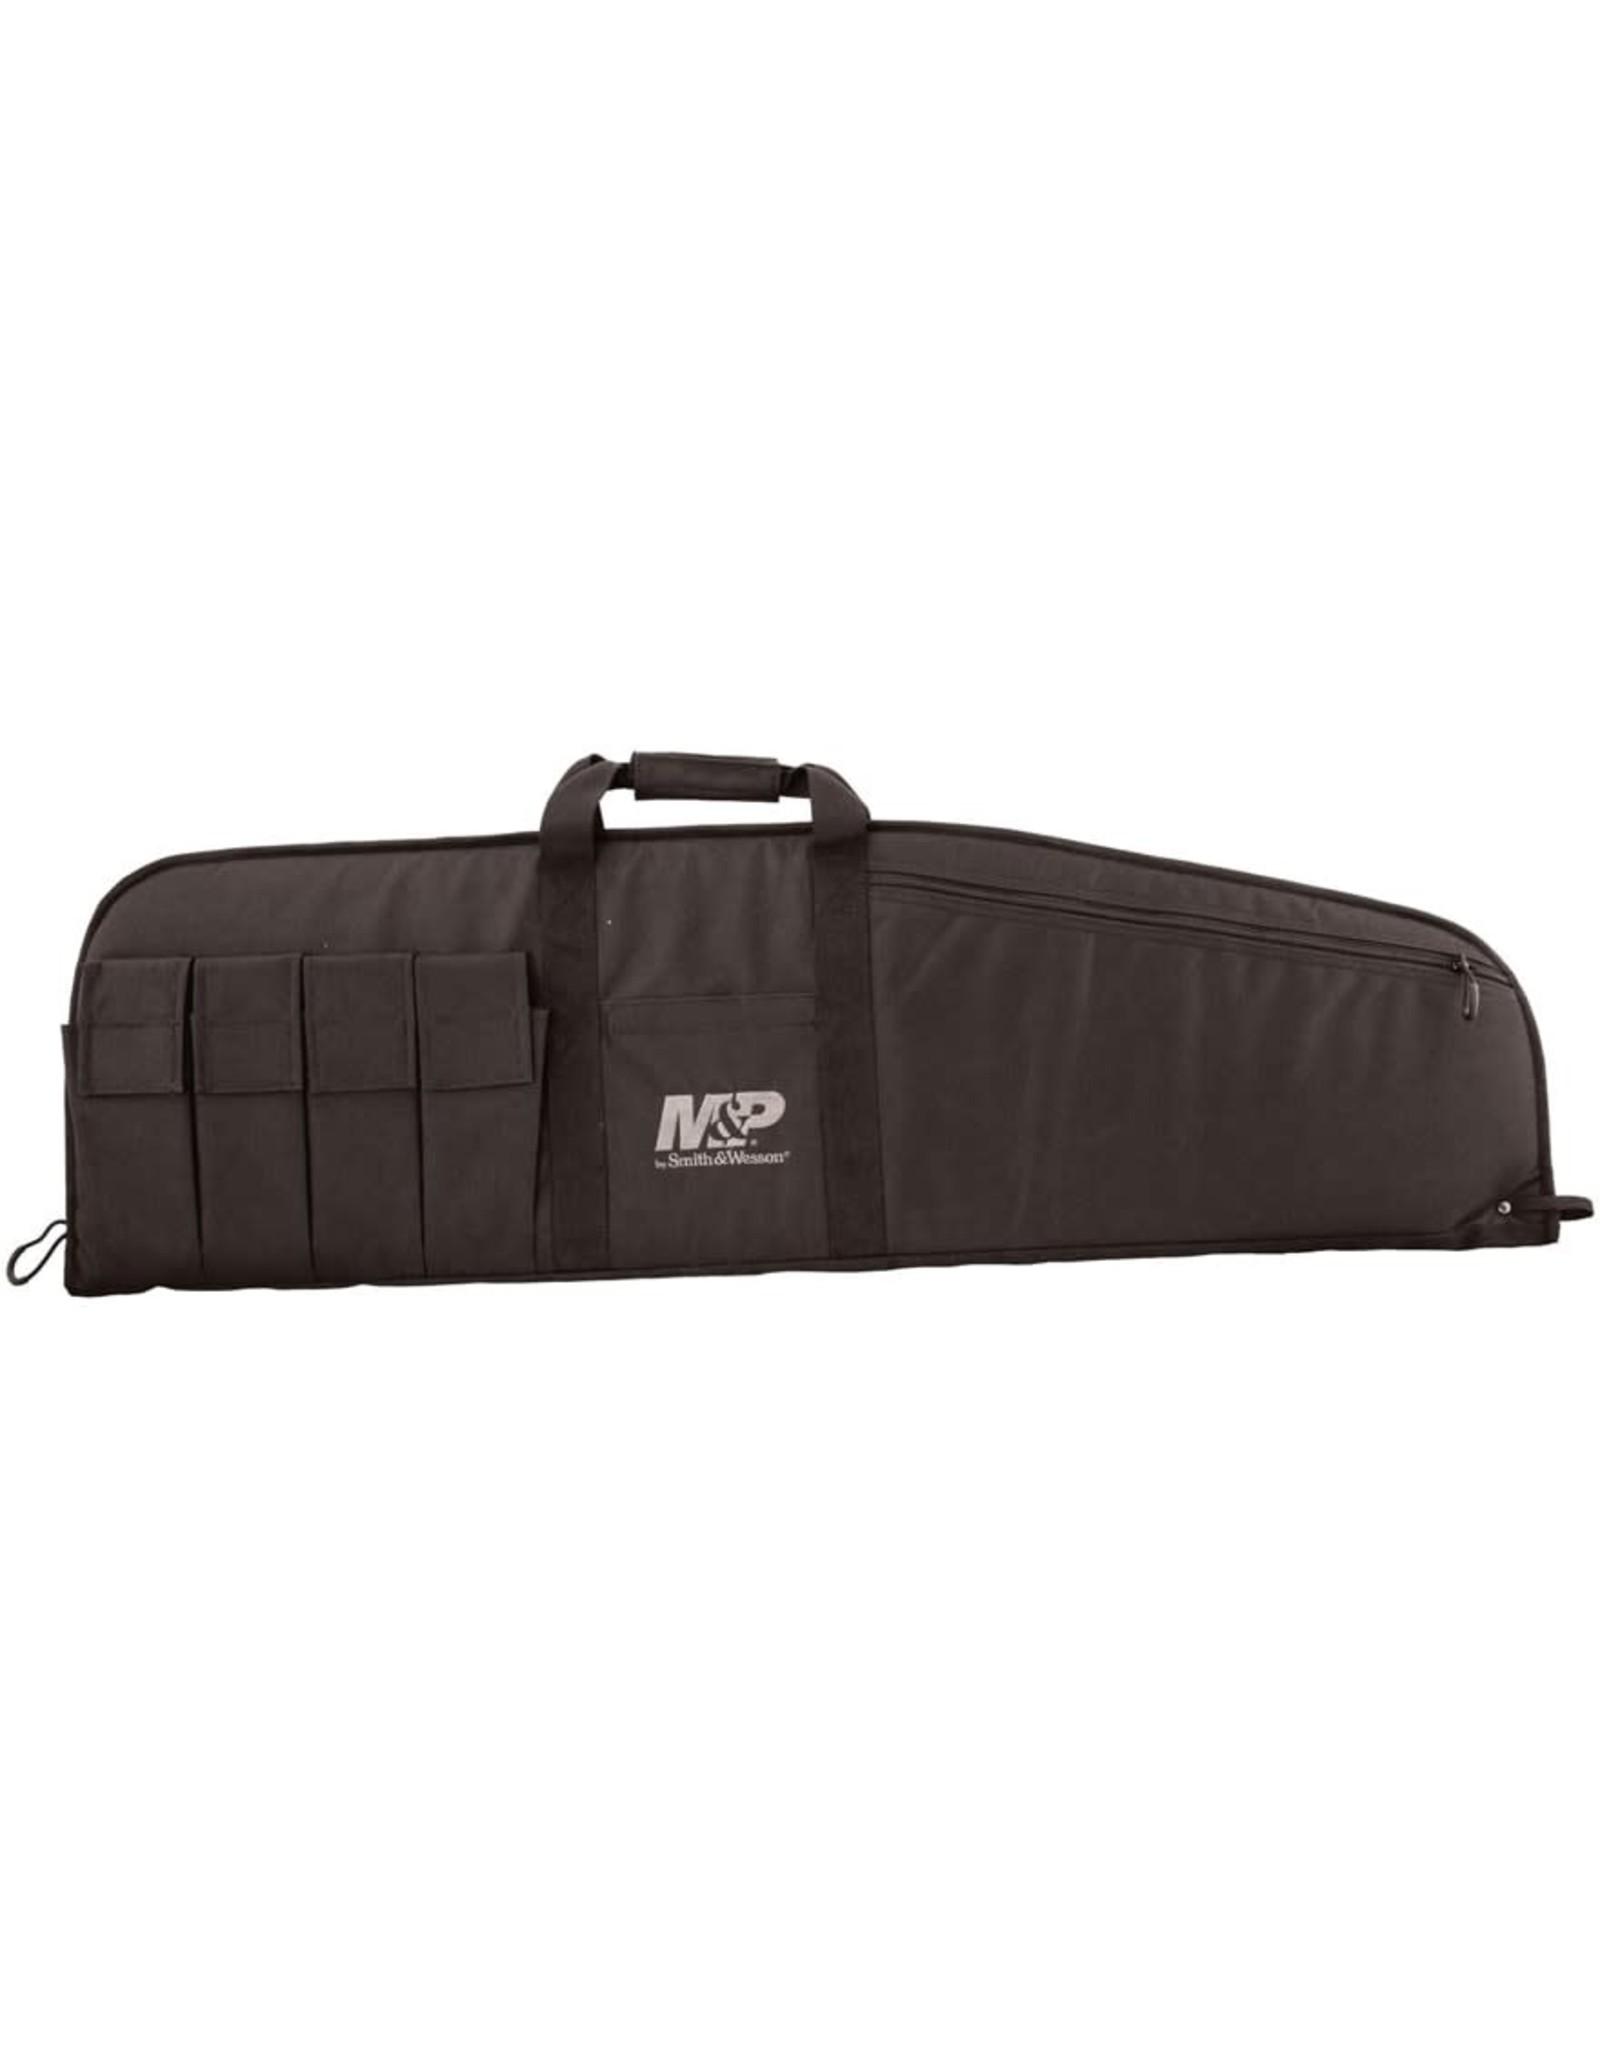 Smith & Wesson Smith & Wesson - M&P Duty Series - Medium Gun Case - Black